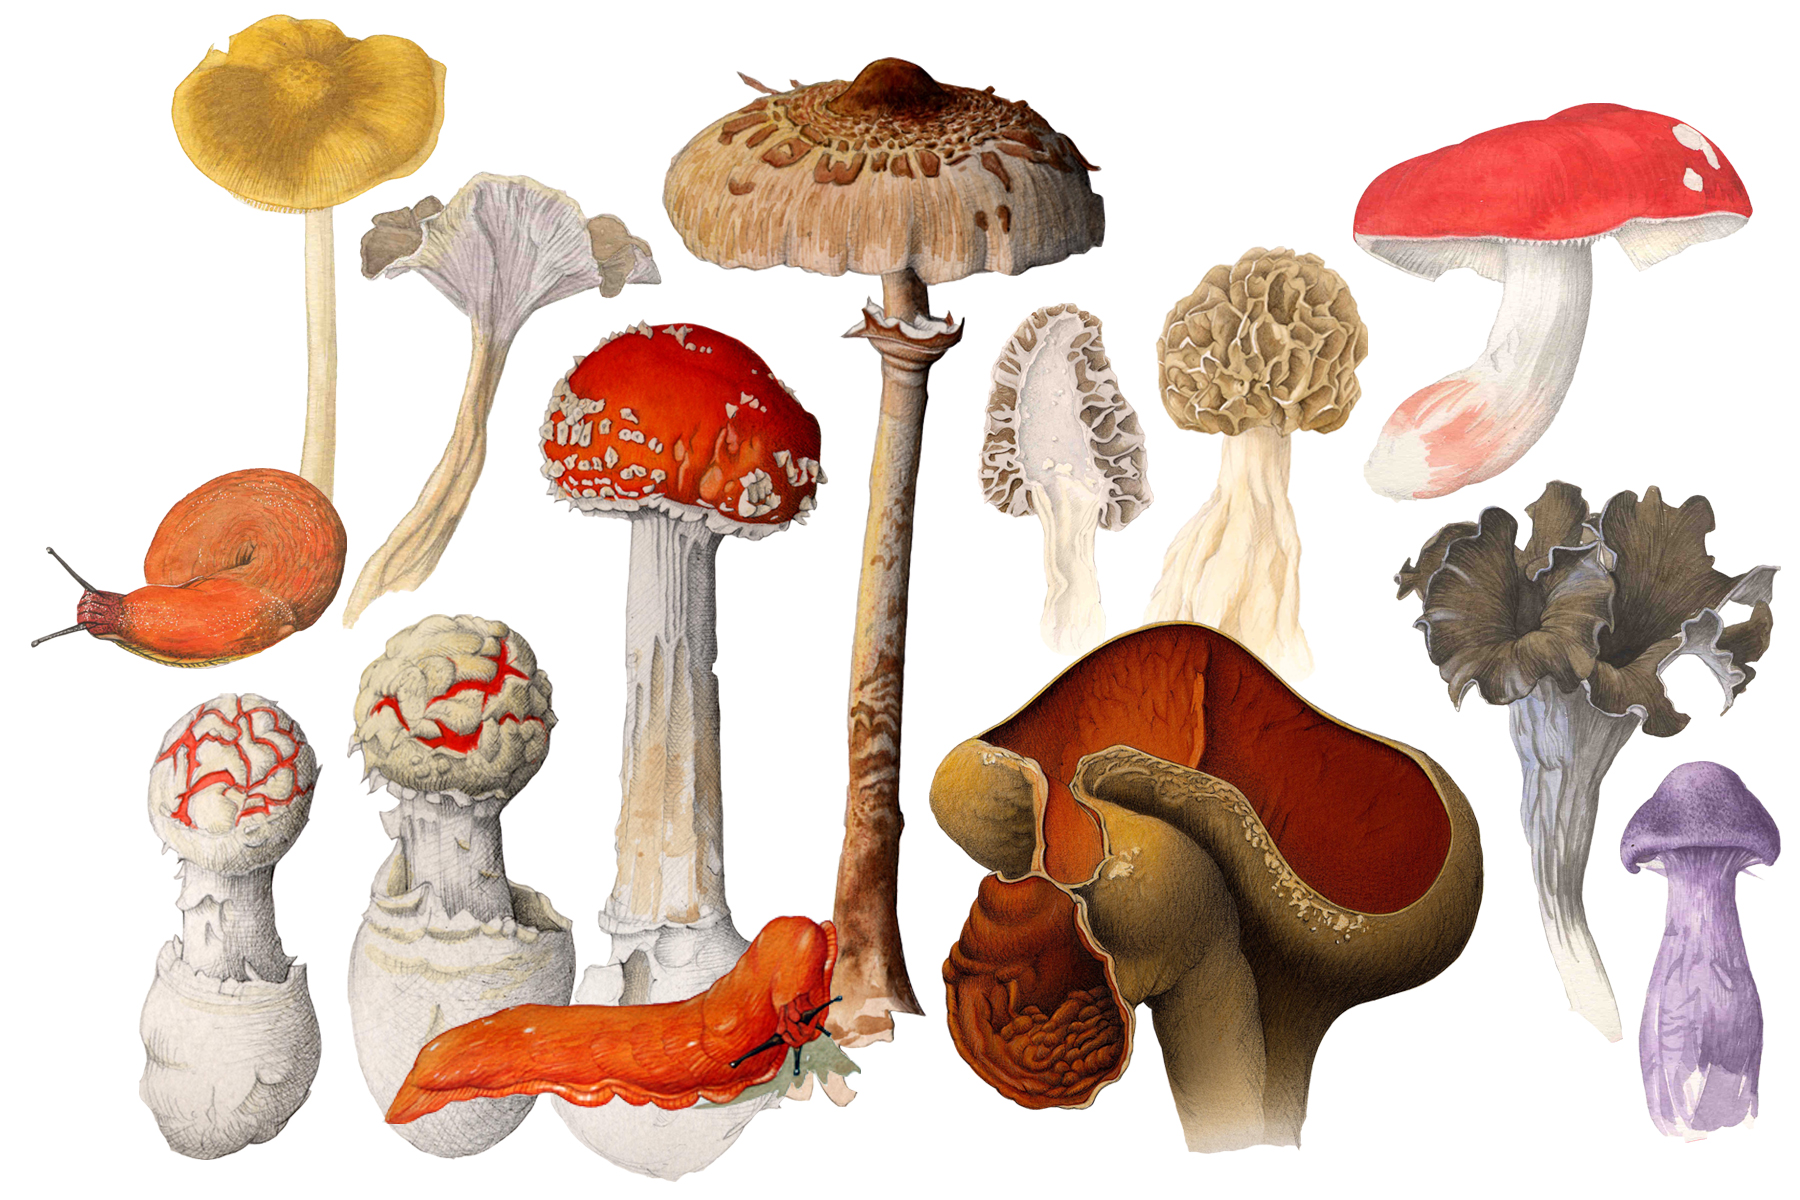 mycologie-hd